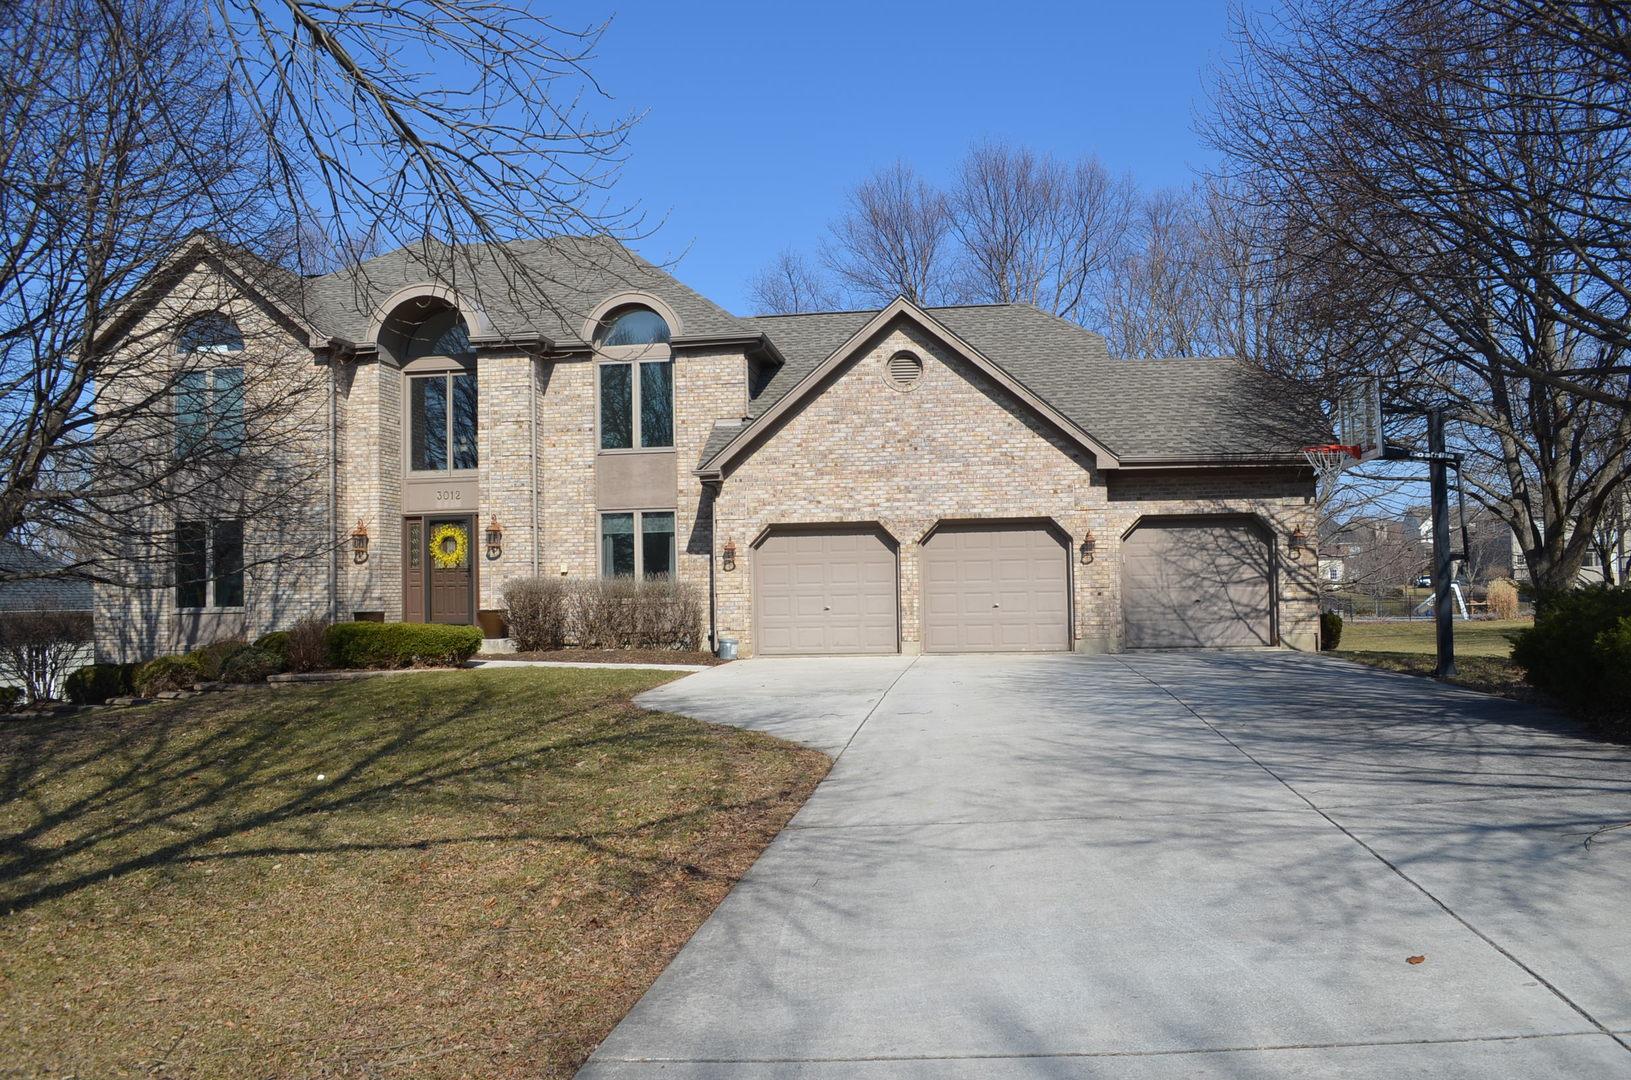 Property for sale at 3012 Woods Creek Lane, Algonquin,  IL 60102